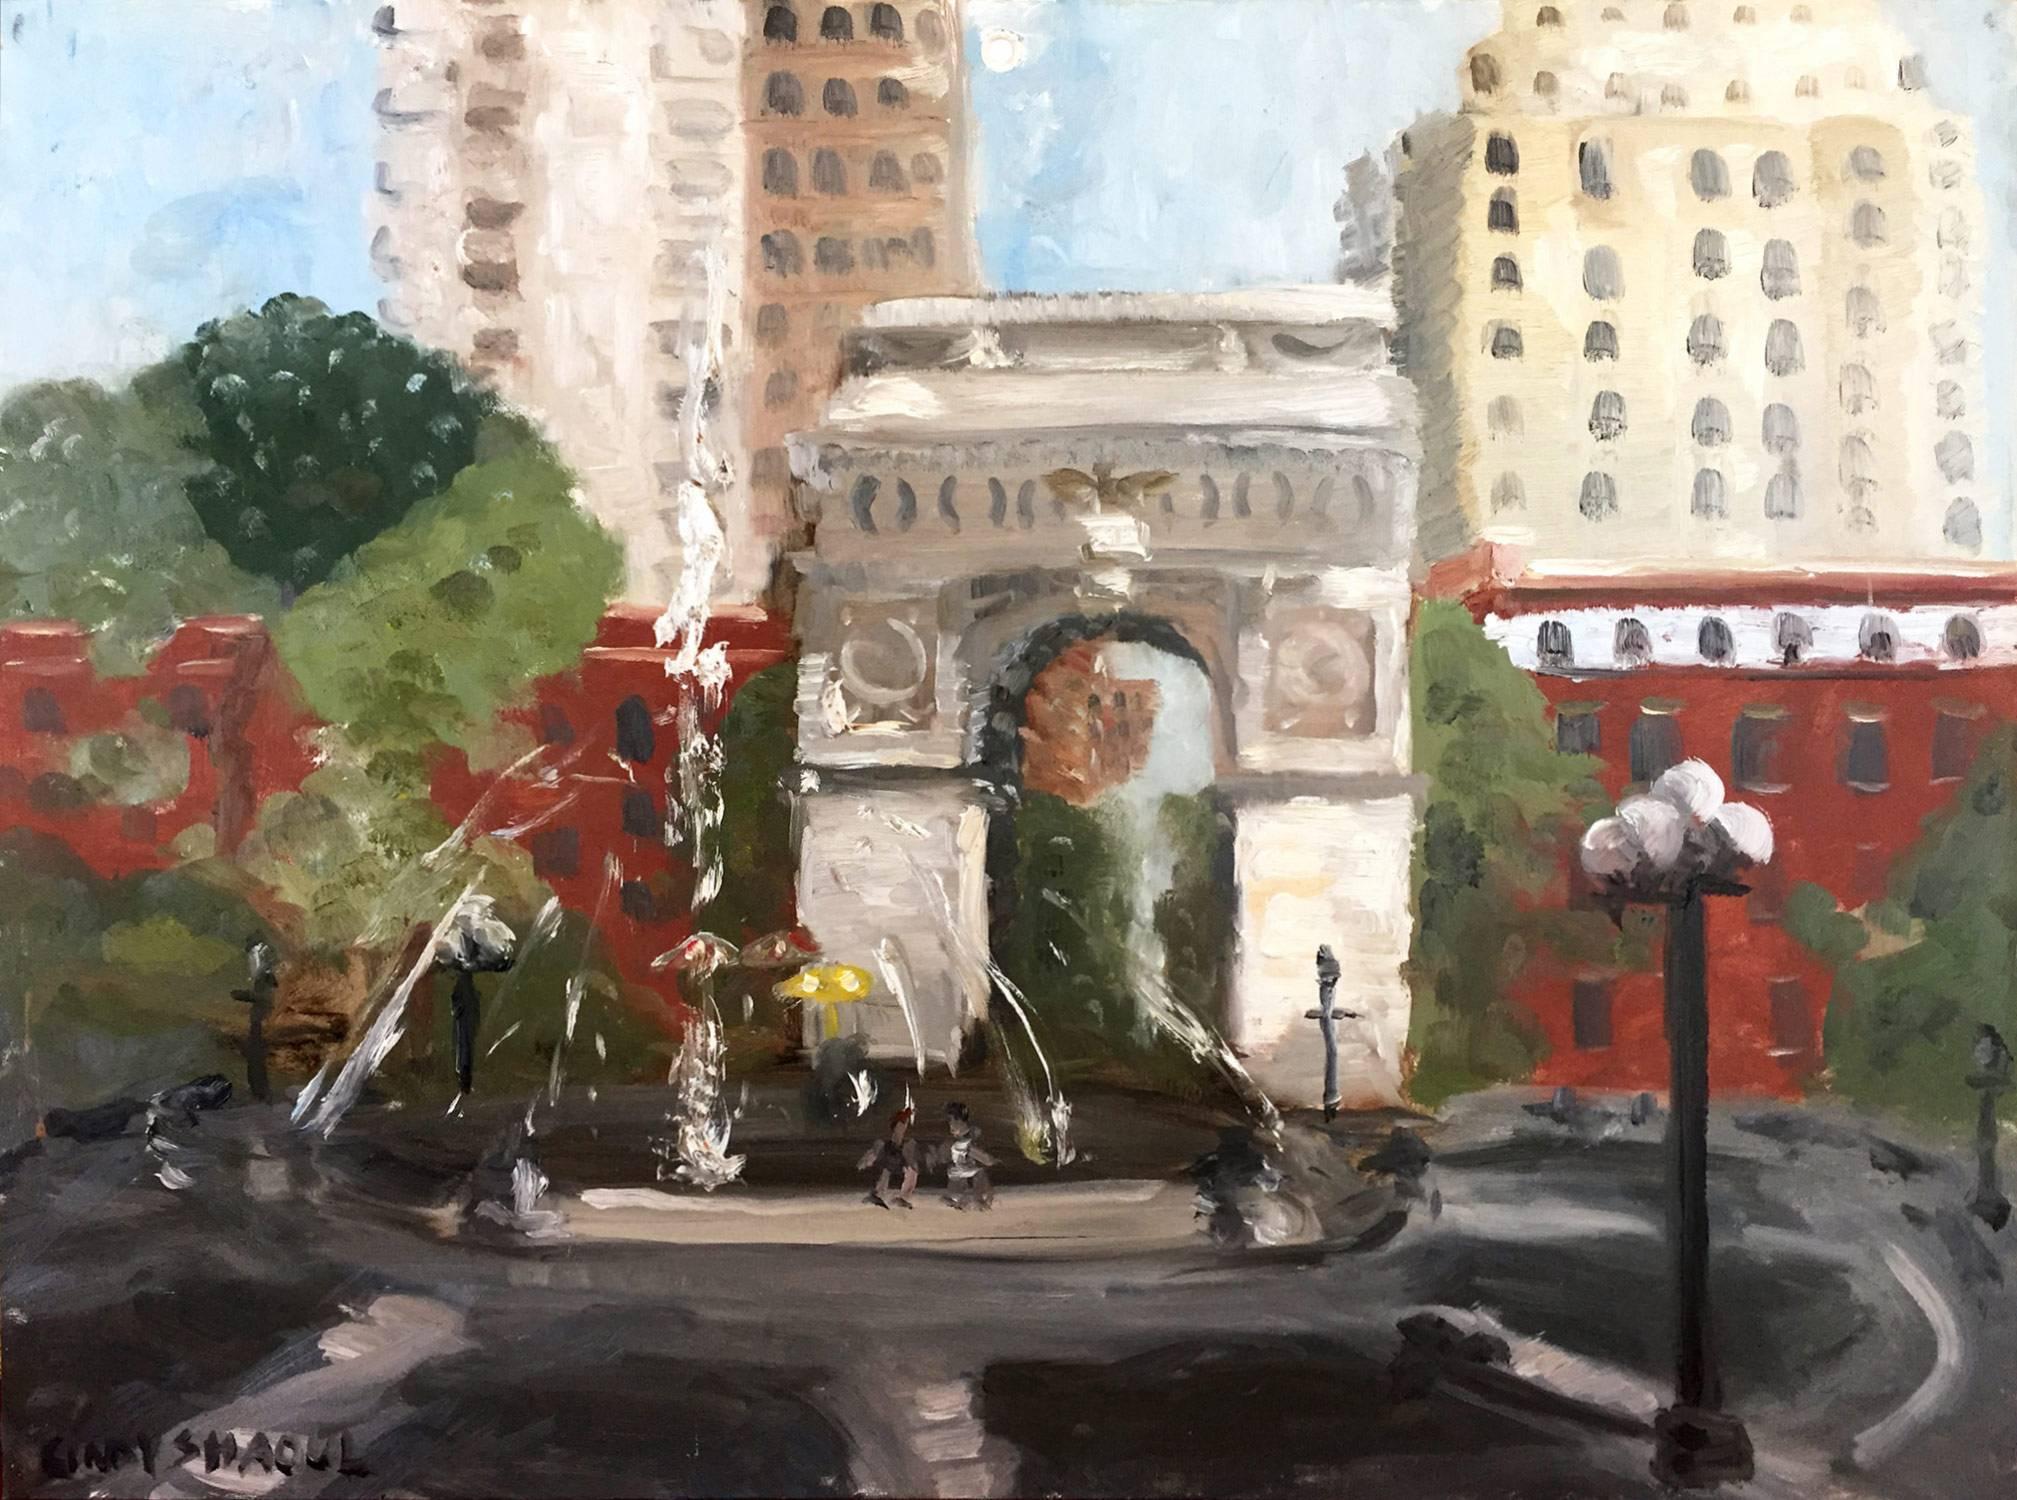 A Day Out, Washington Square Park